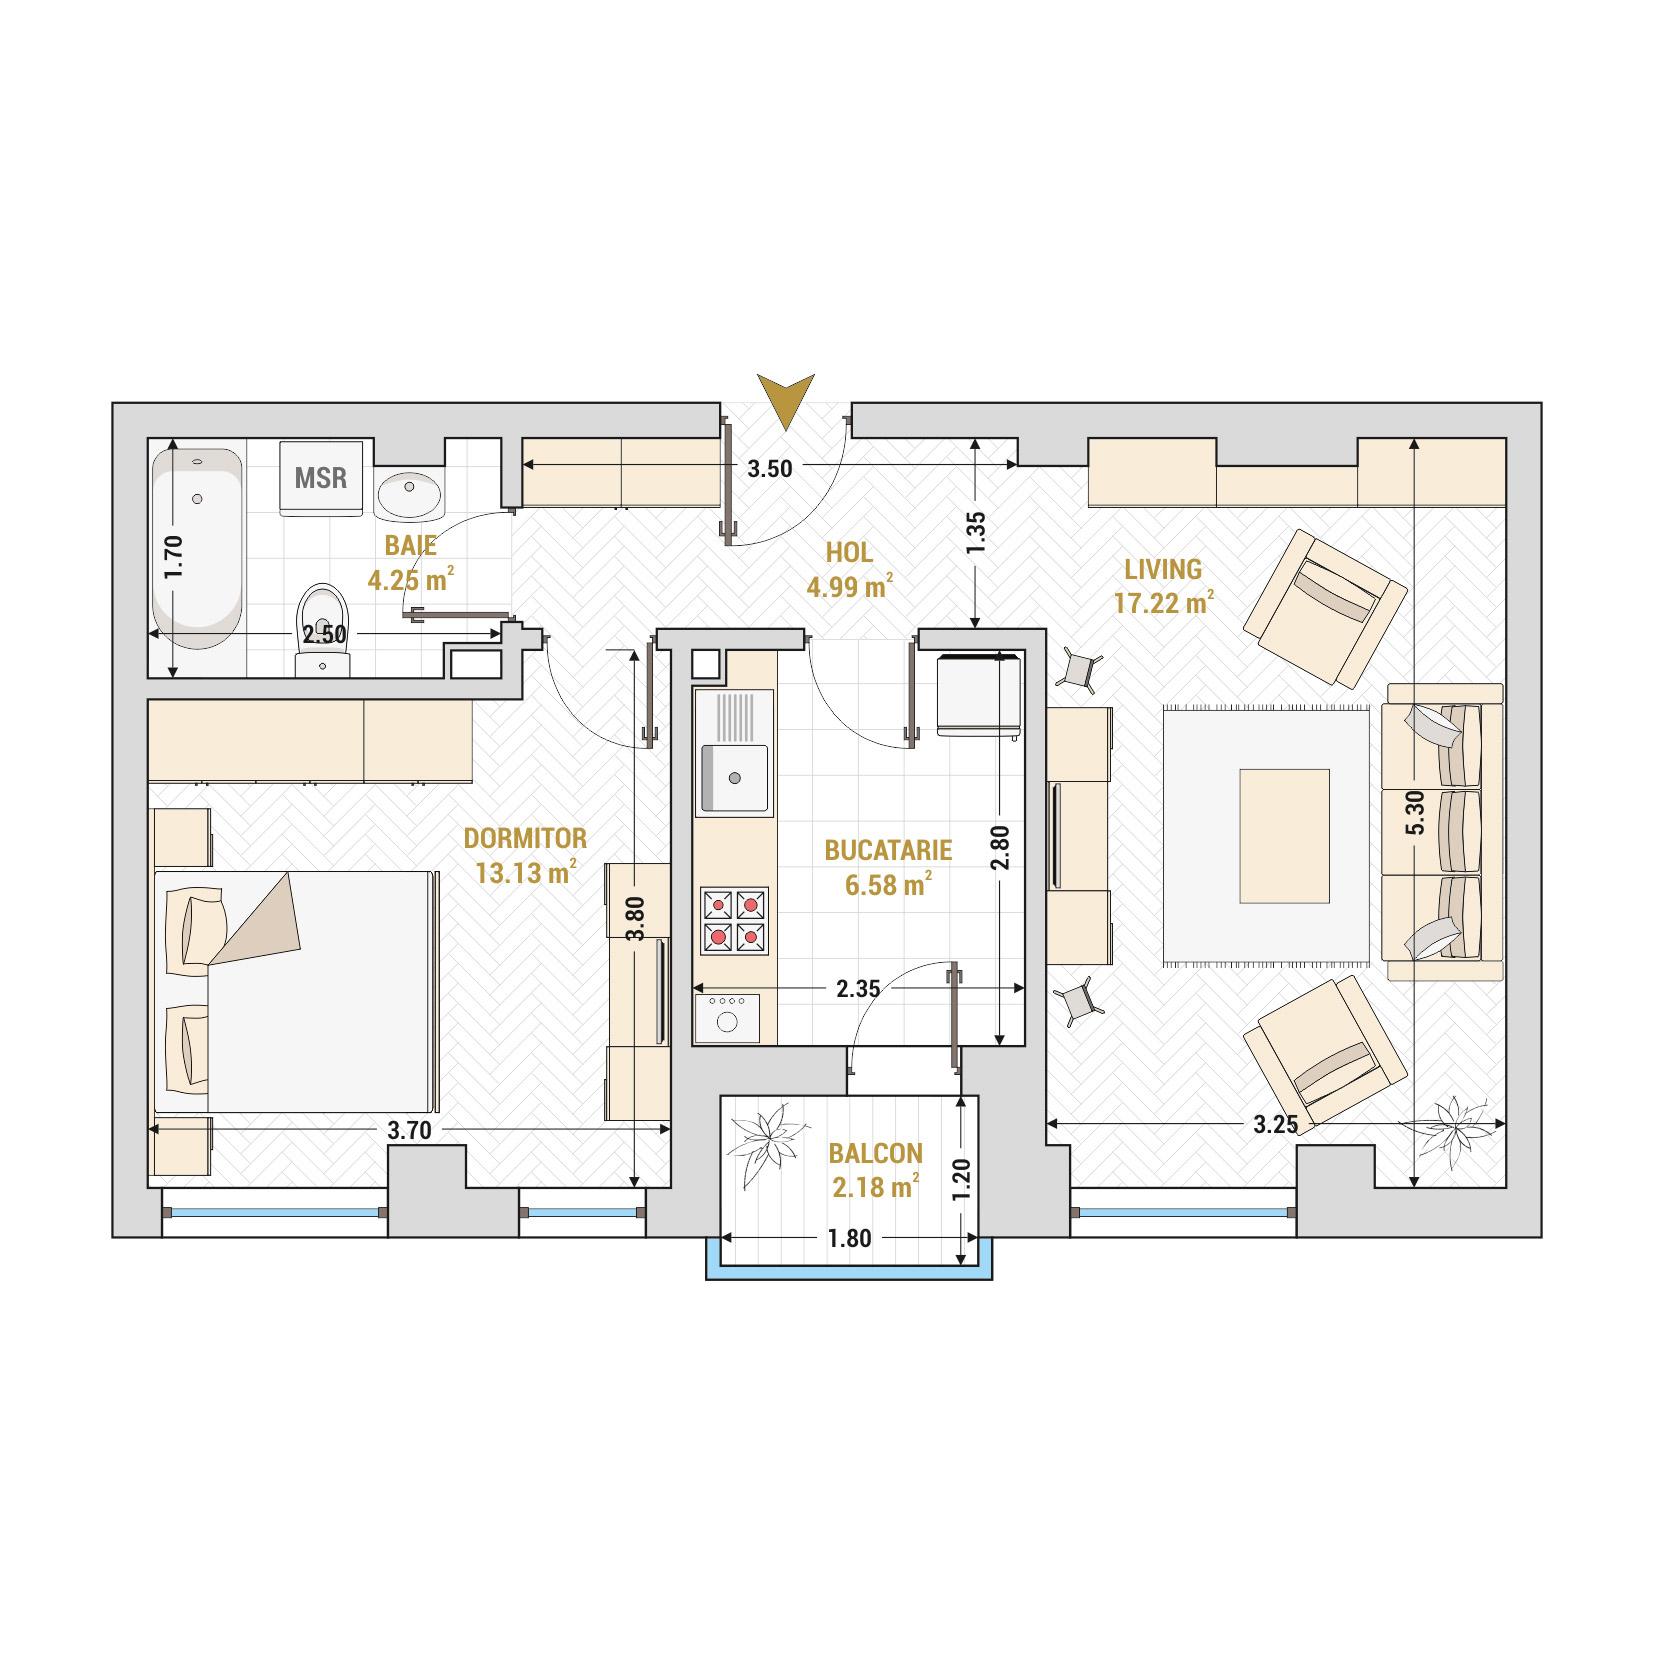 Apartament 2 camere de vanzare Bucuresti - Catedral Residence - Marriott, Piata Unirii, 13 Septembrie, Izvor - Tip 1 - T2